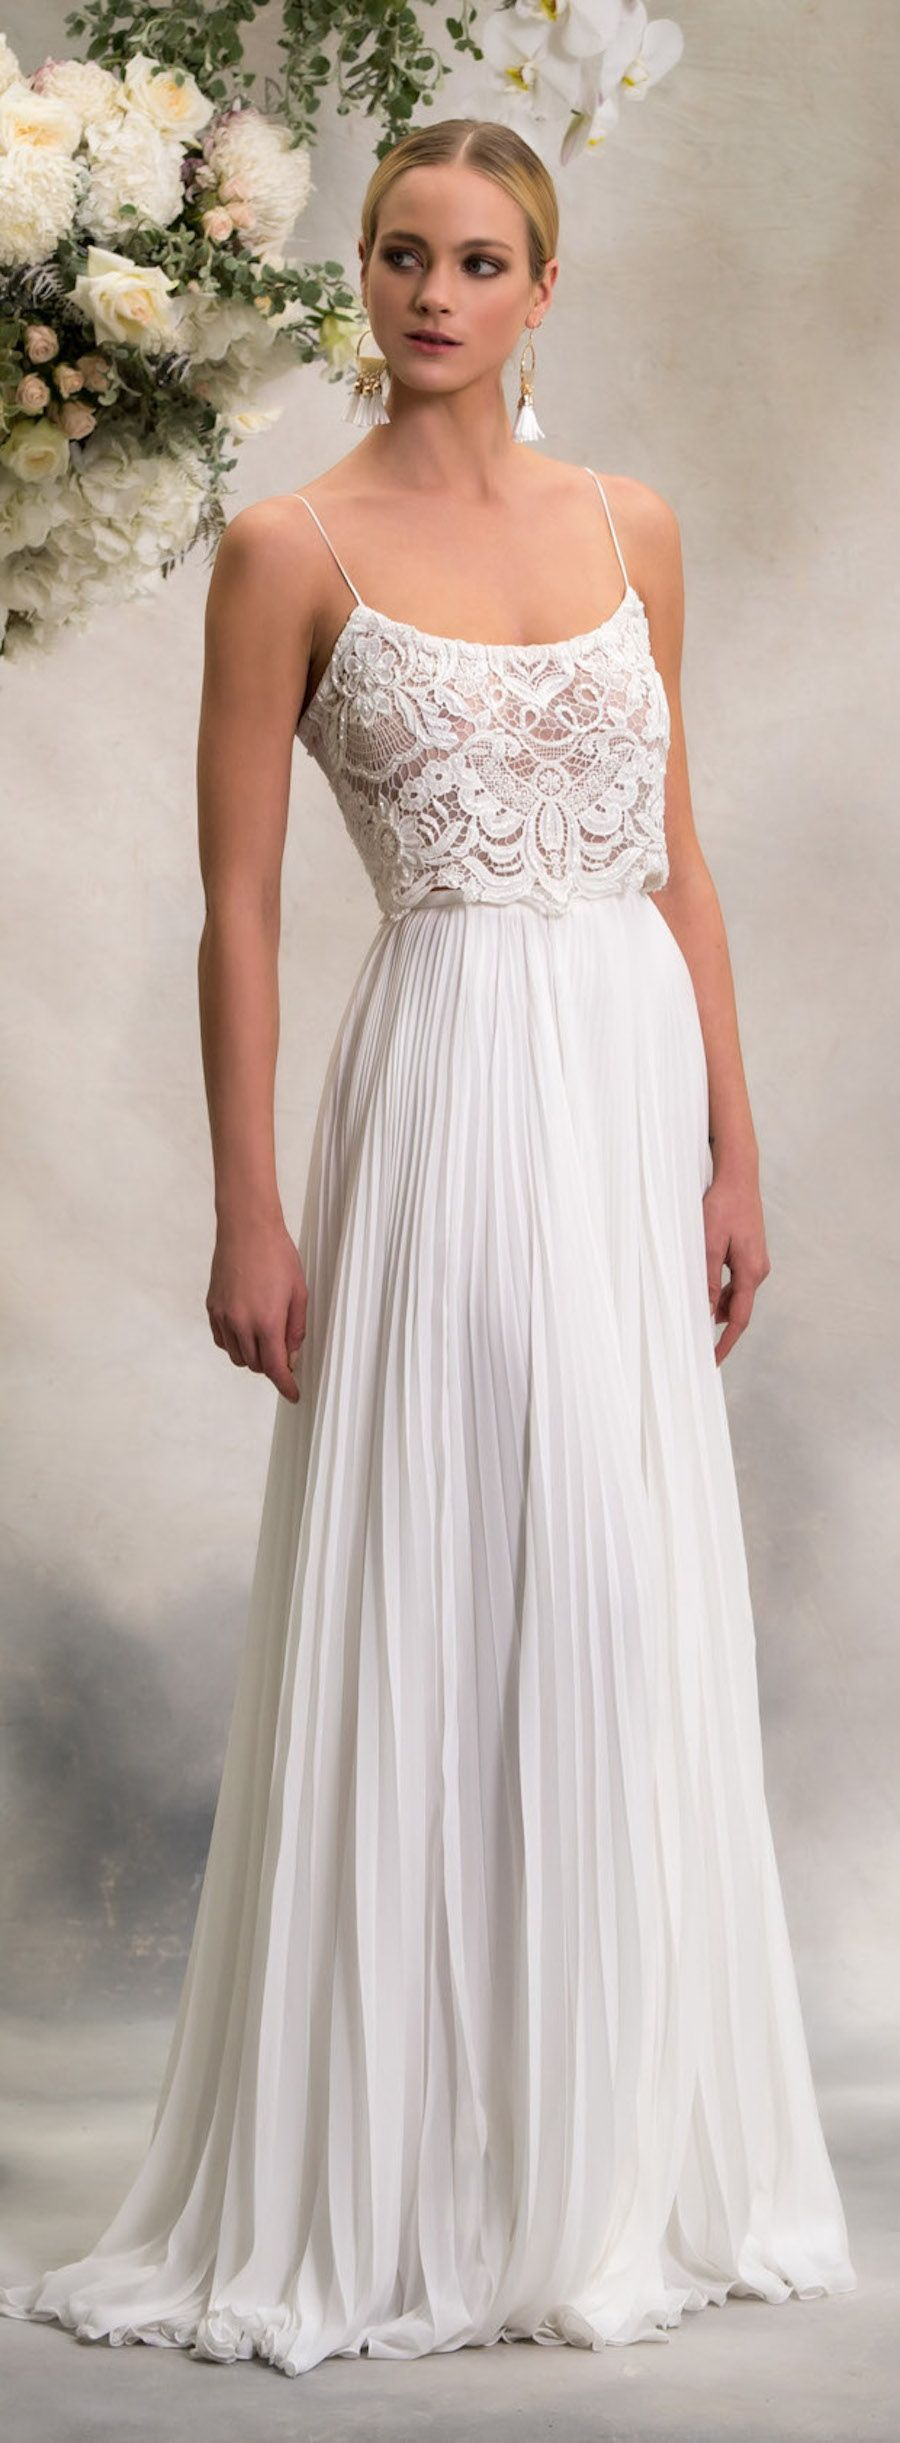 Anna georgina wedding dress a treasured moment pinterest